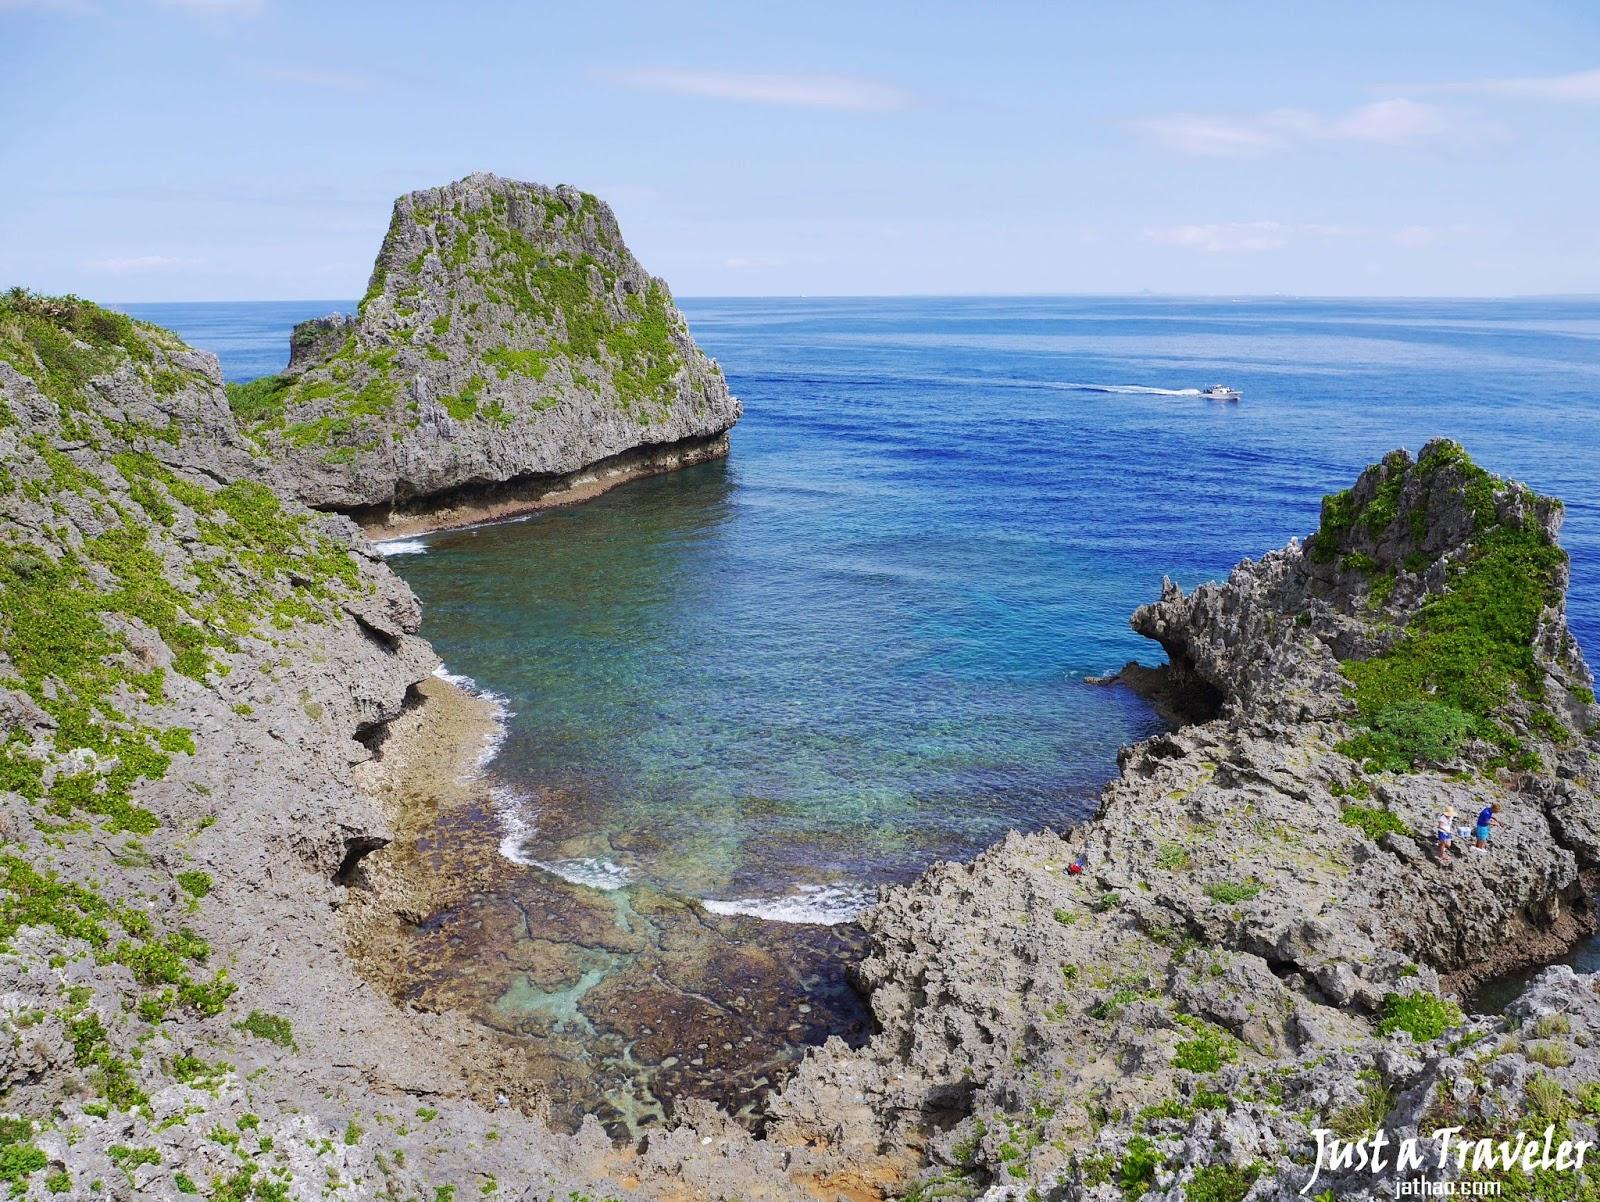 沖繩-景點-推薦-真榮田岬-青之洞窟-潛水-浮潛-自由行-旅遊-Okinawa-attraction-maeda-cape-blue-cave-Toruist-destination